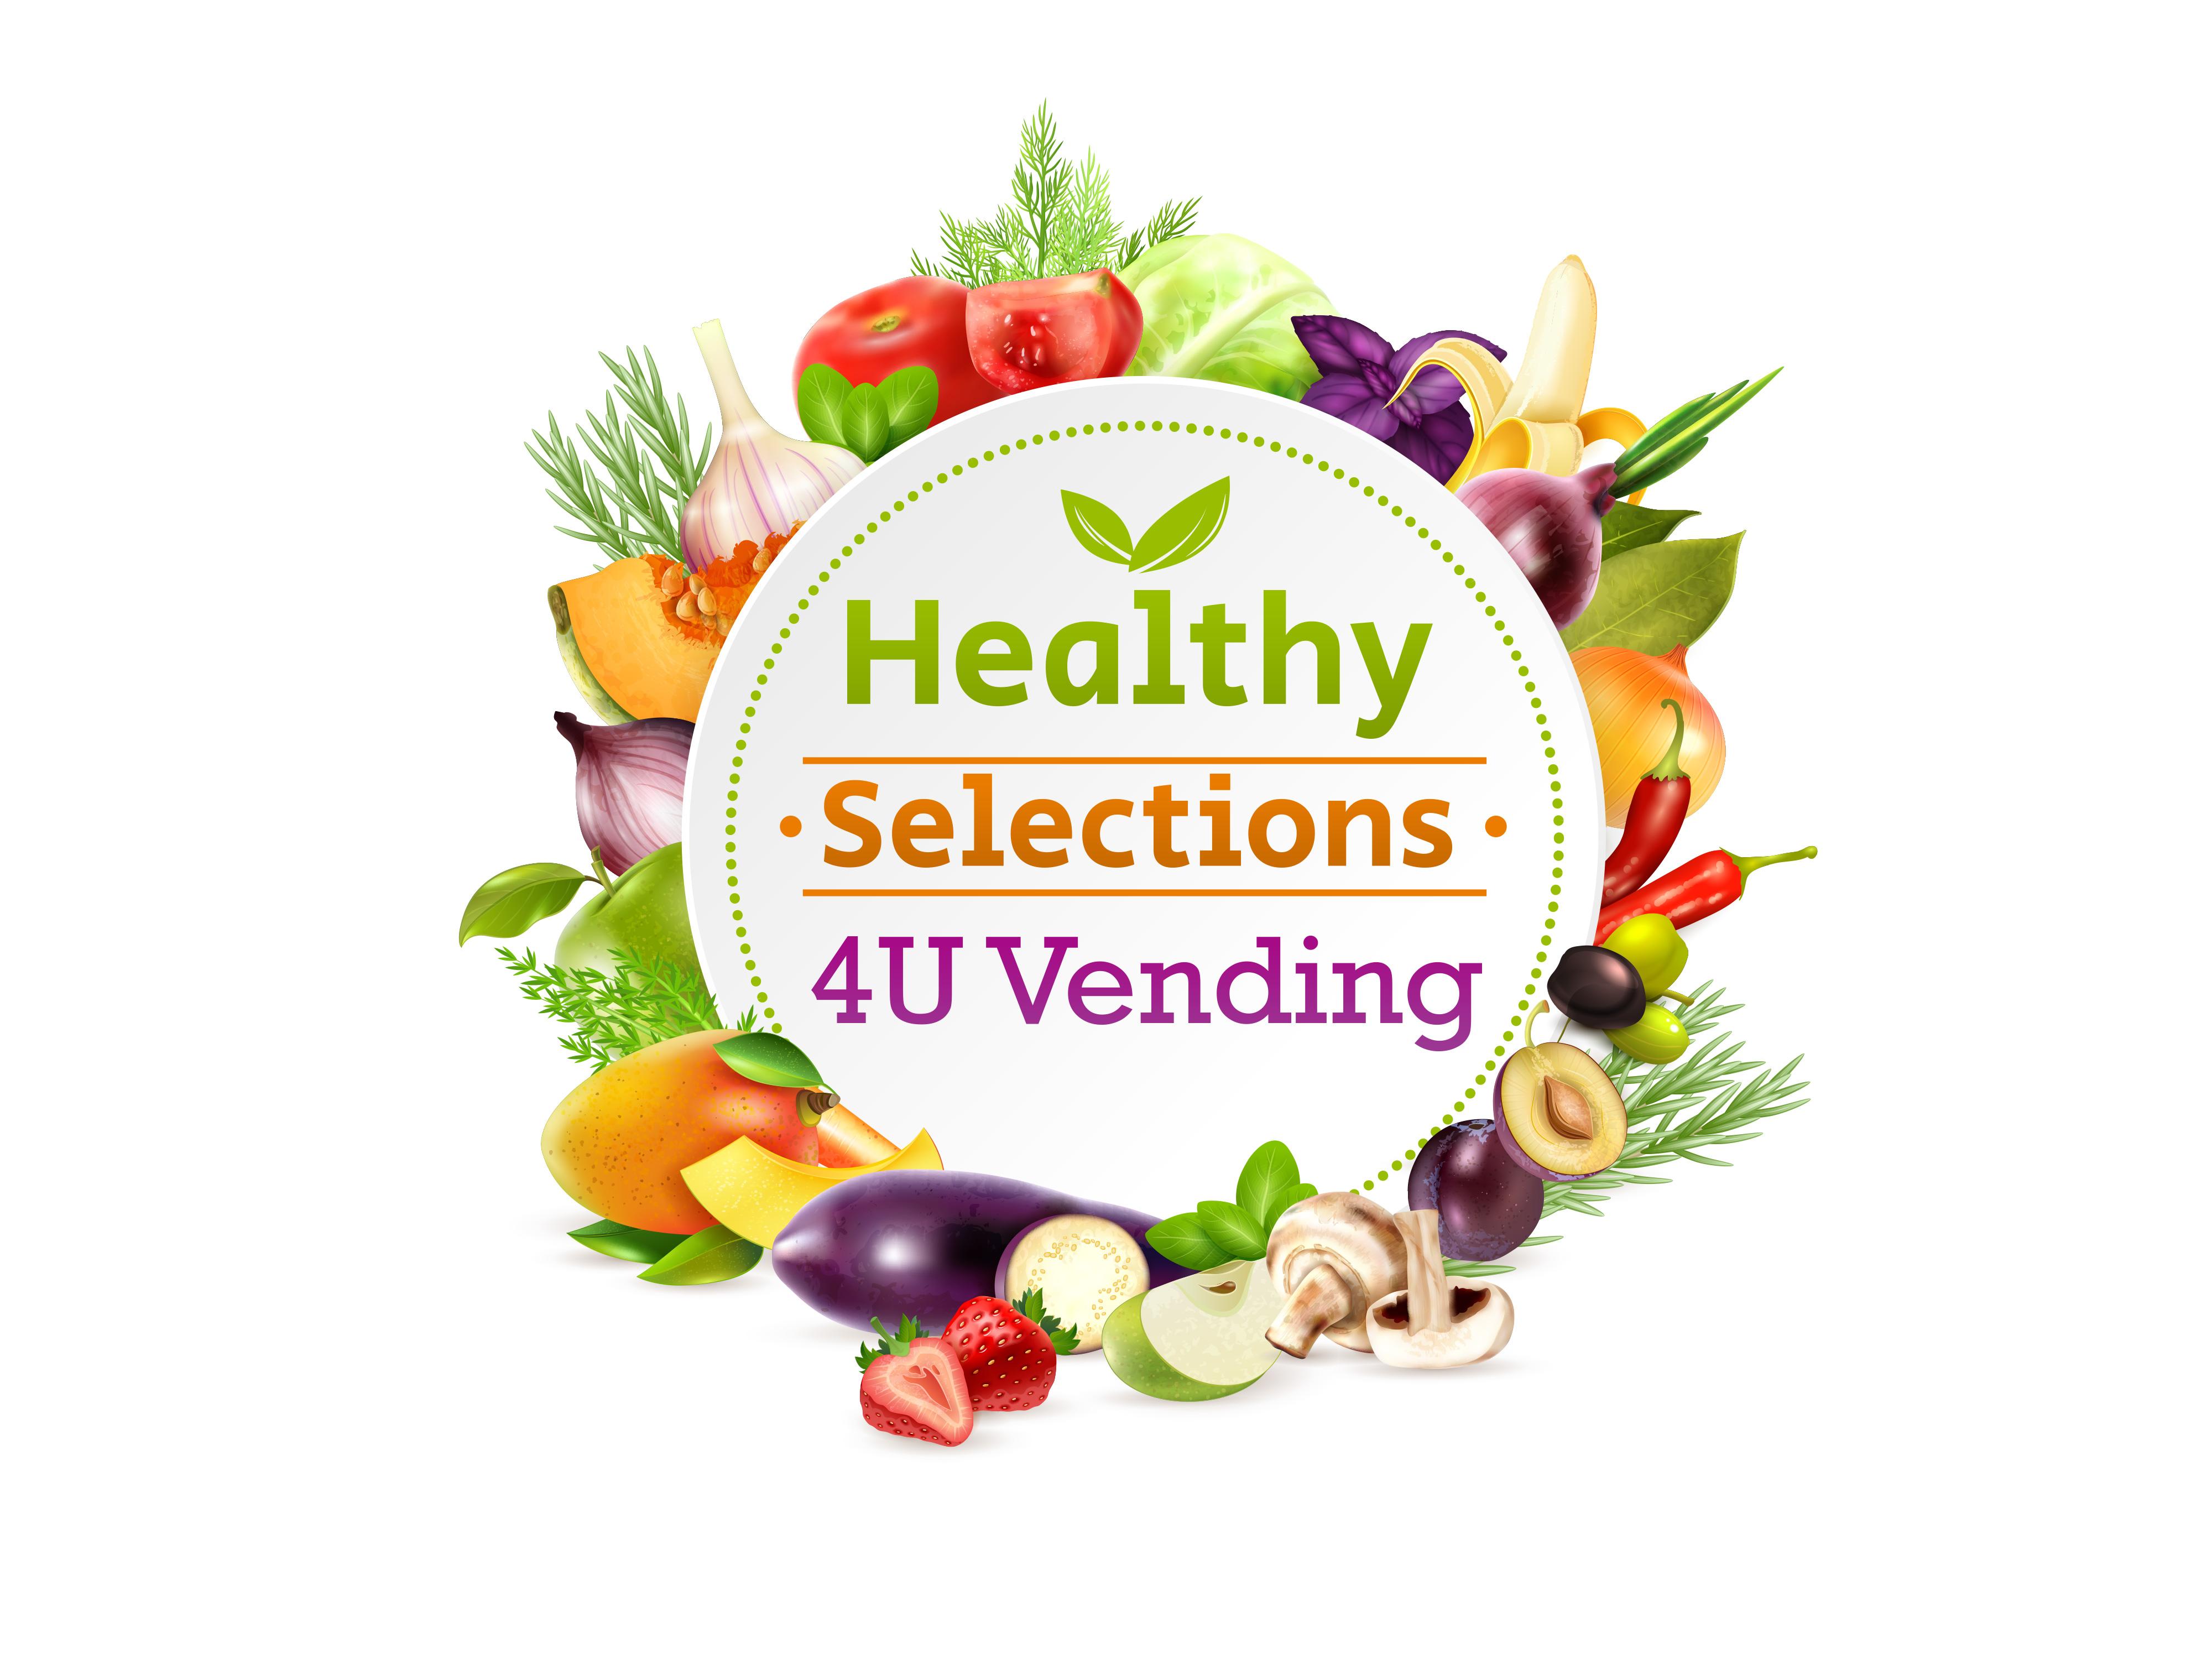 Healthy Selections 4U Vending